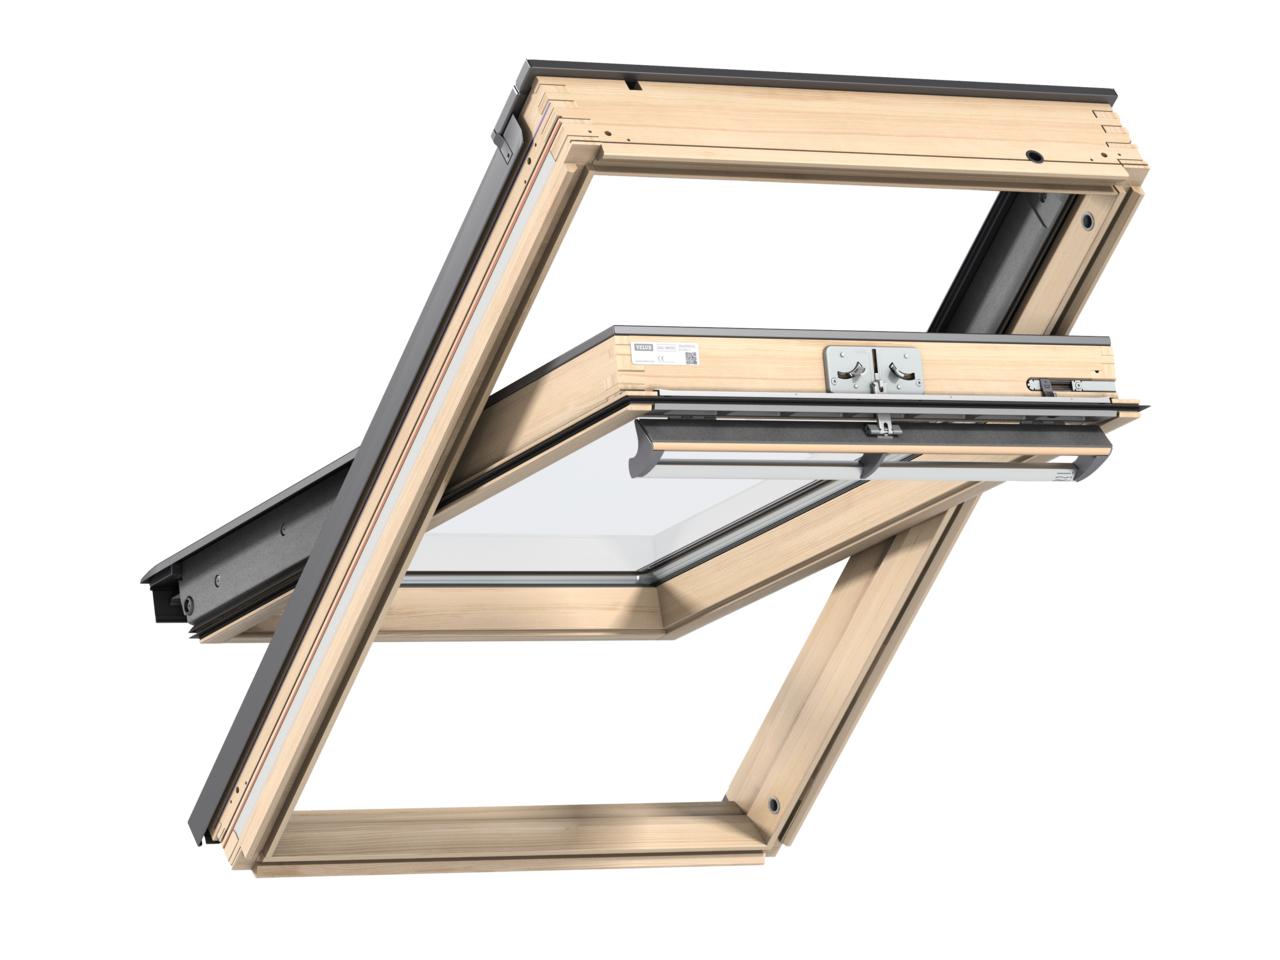 Velux GGL CK04 550 x 980mm Centre Pivot Standard 70Pane Roof Window - Pine